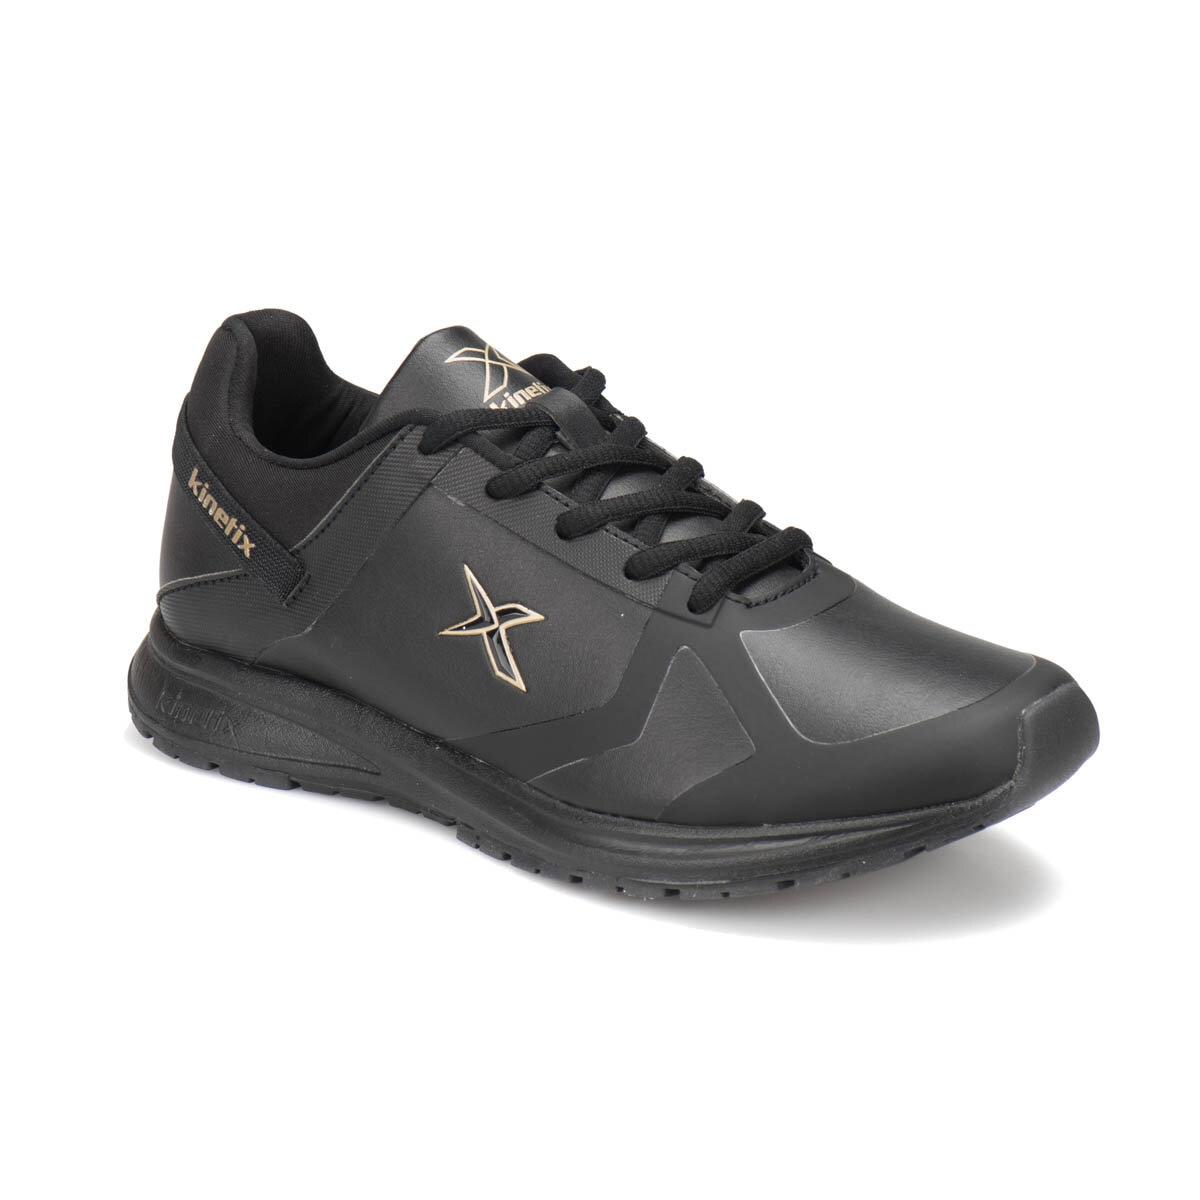 FLO IRONA PU Black Women 'S Fitness Shoes KINETIX